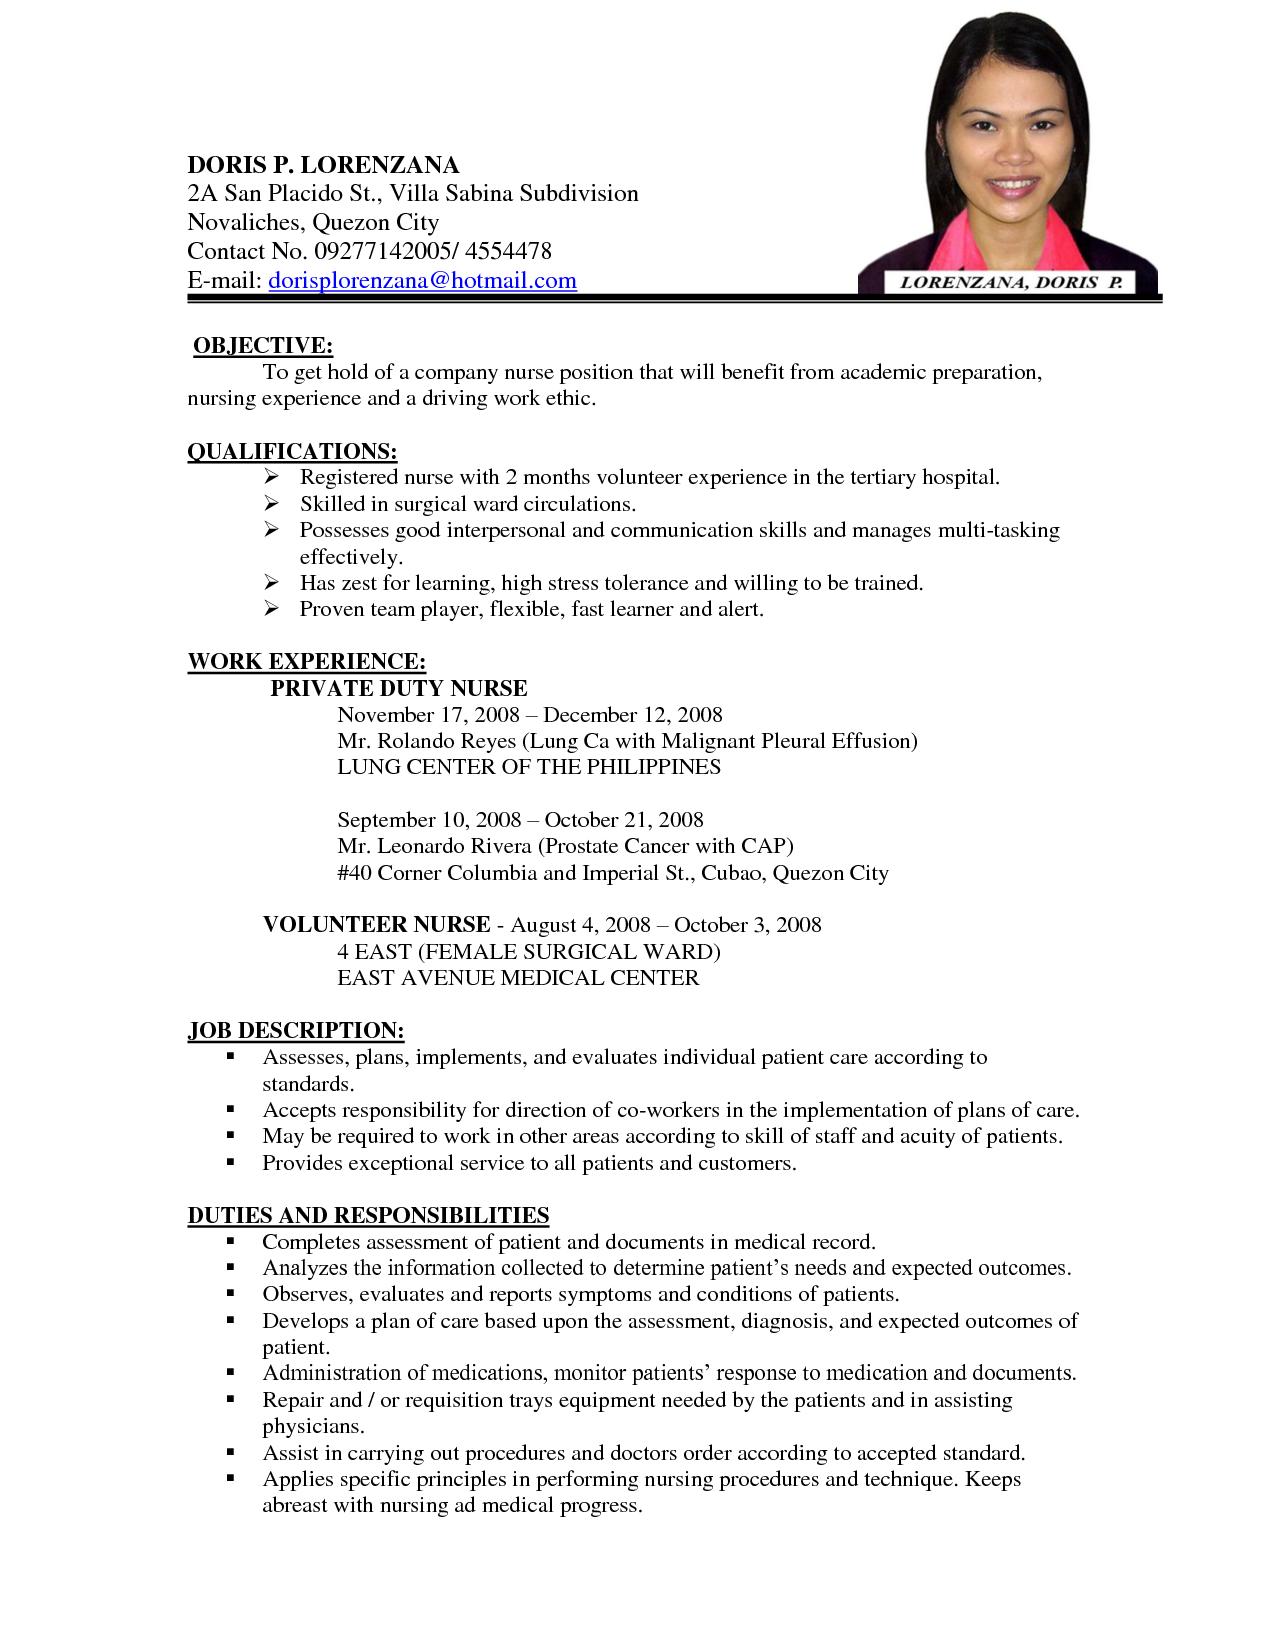 Cv Resume Example Pdf